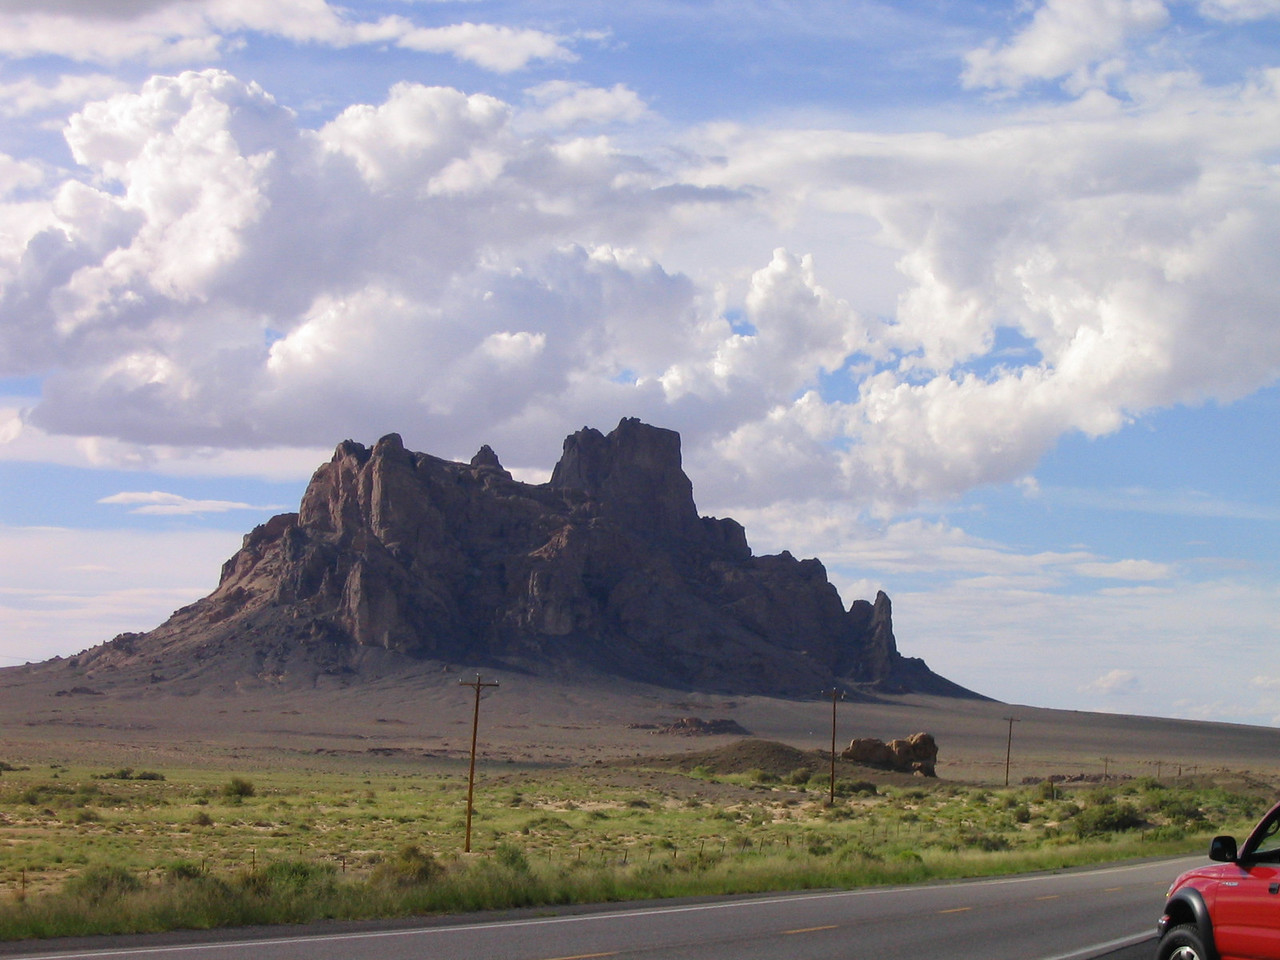 the new Shiprock, AZ